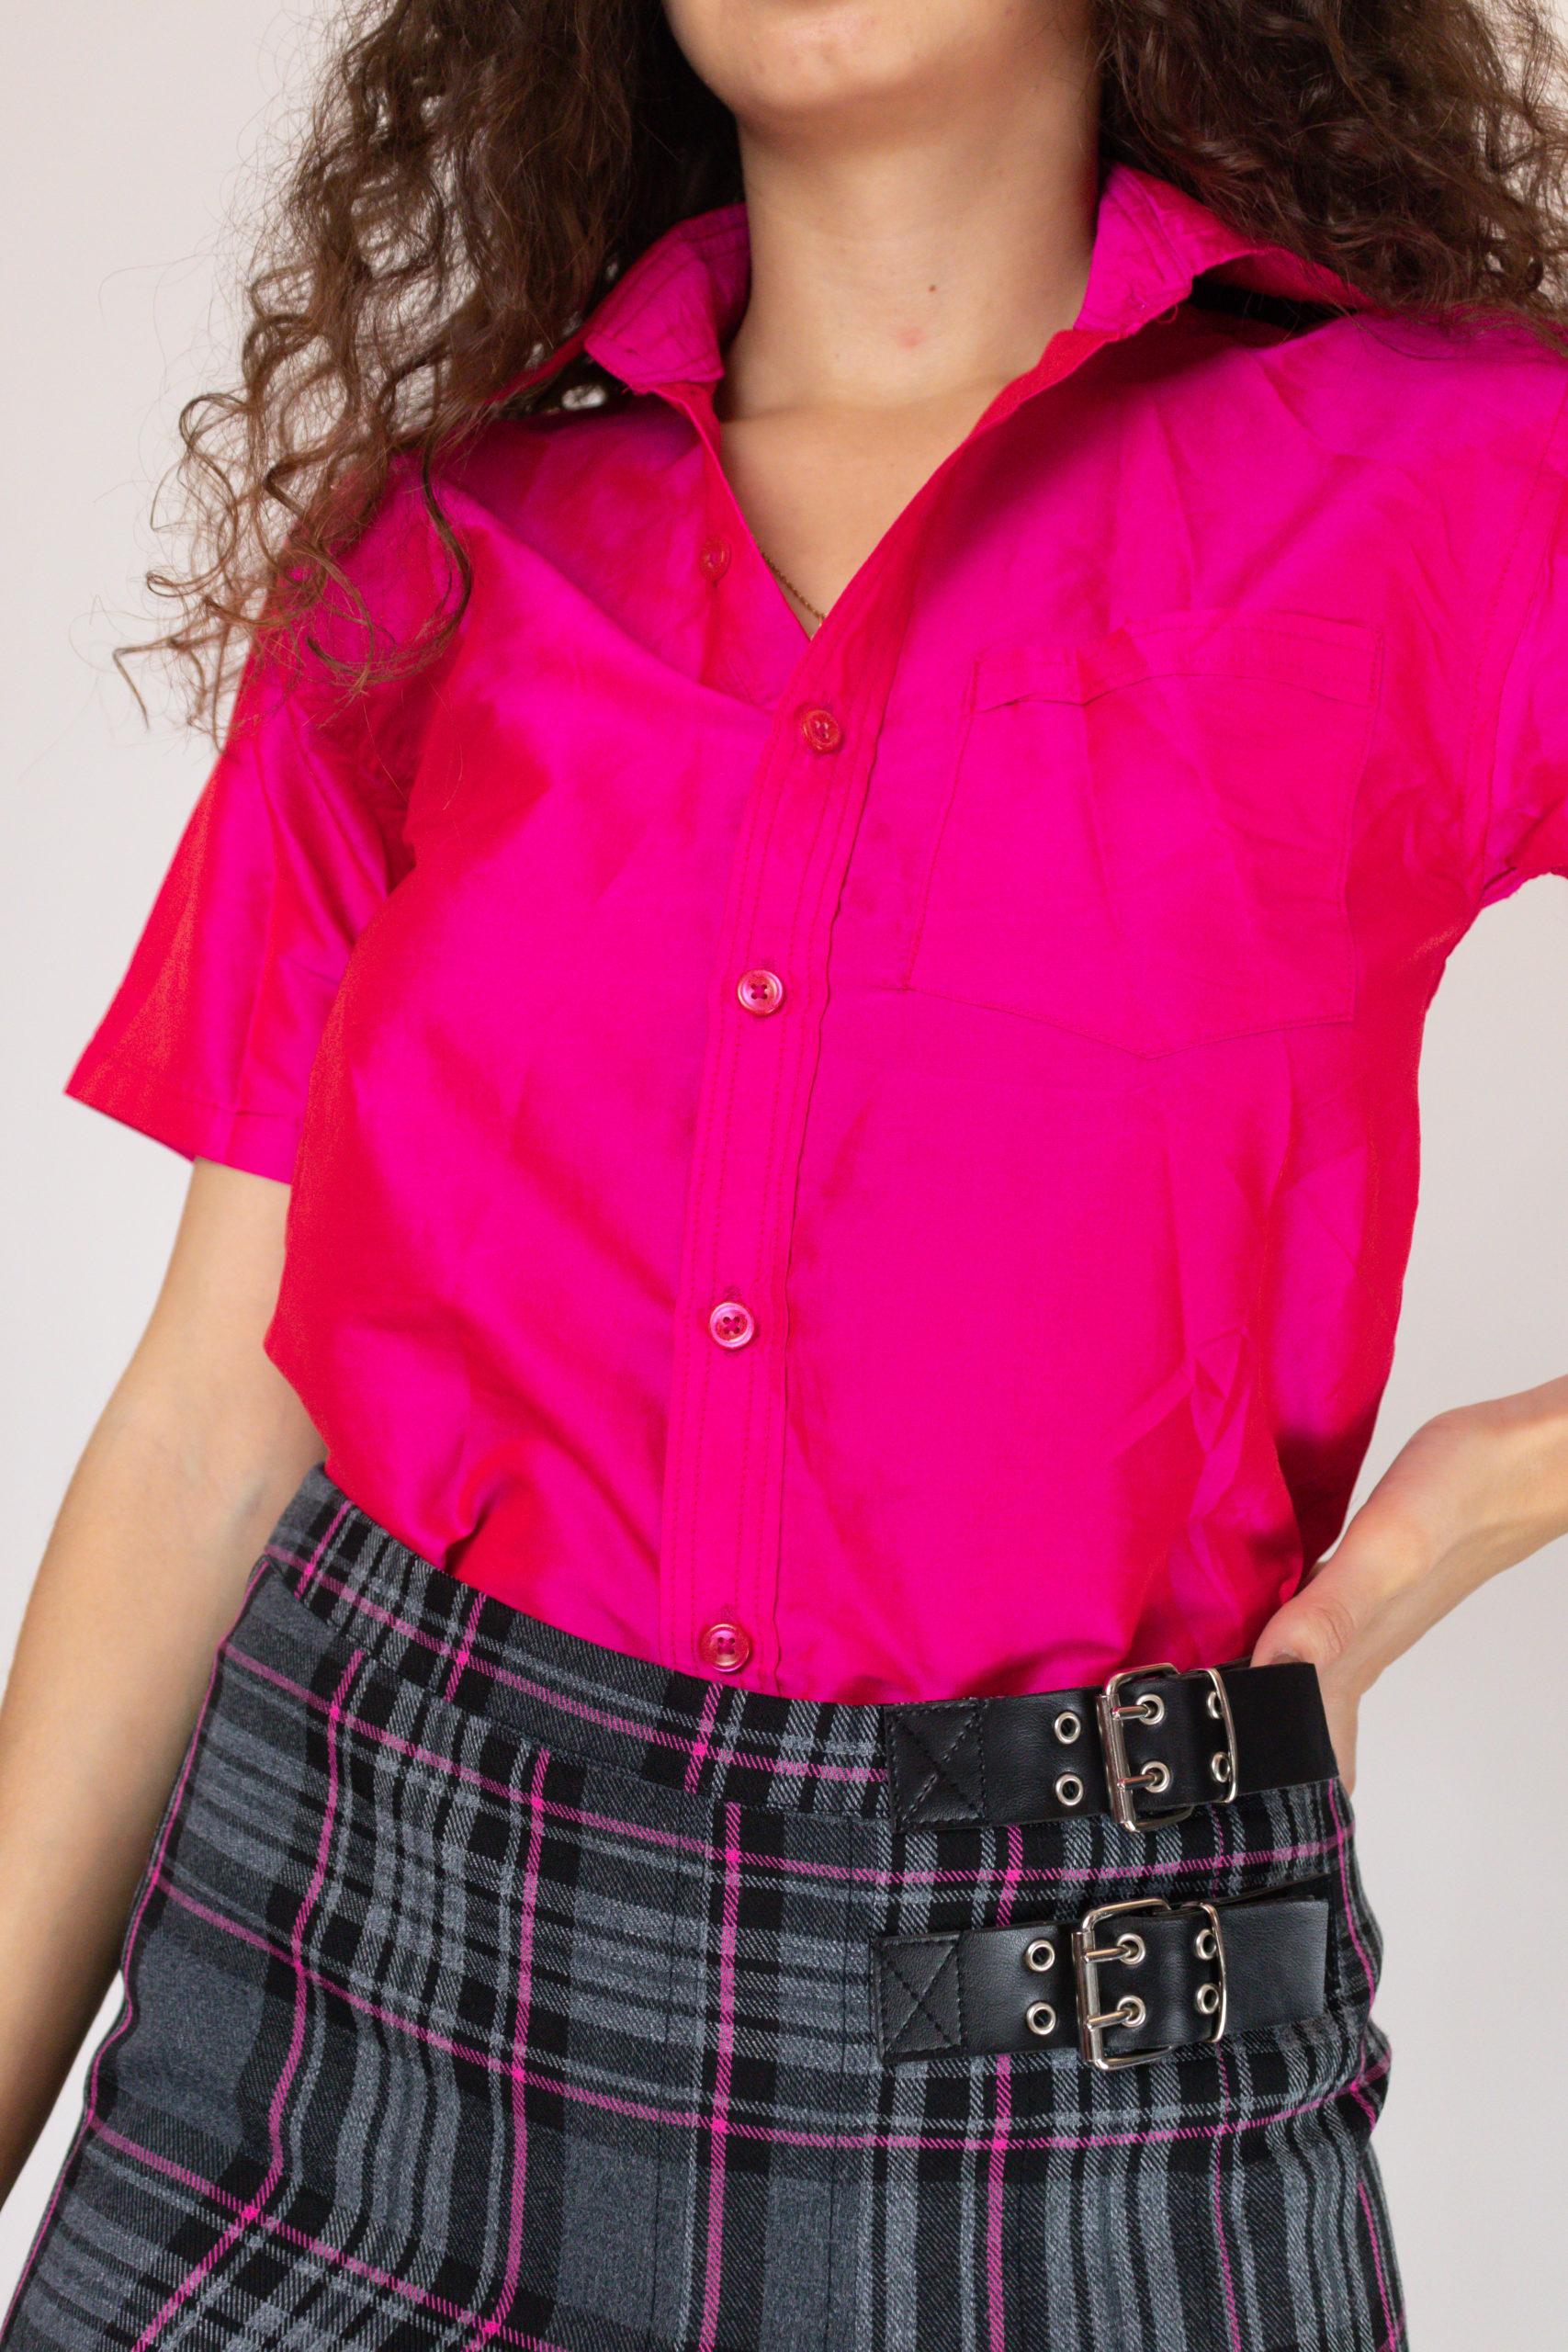 chemise fushia à manches courtes (2)